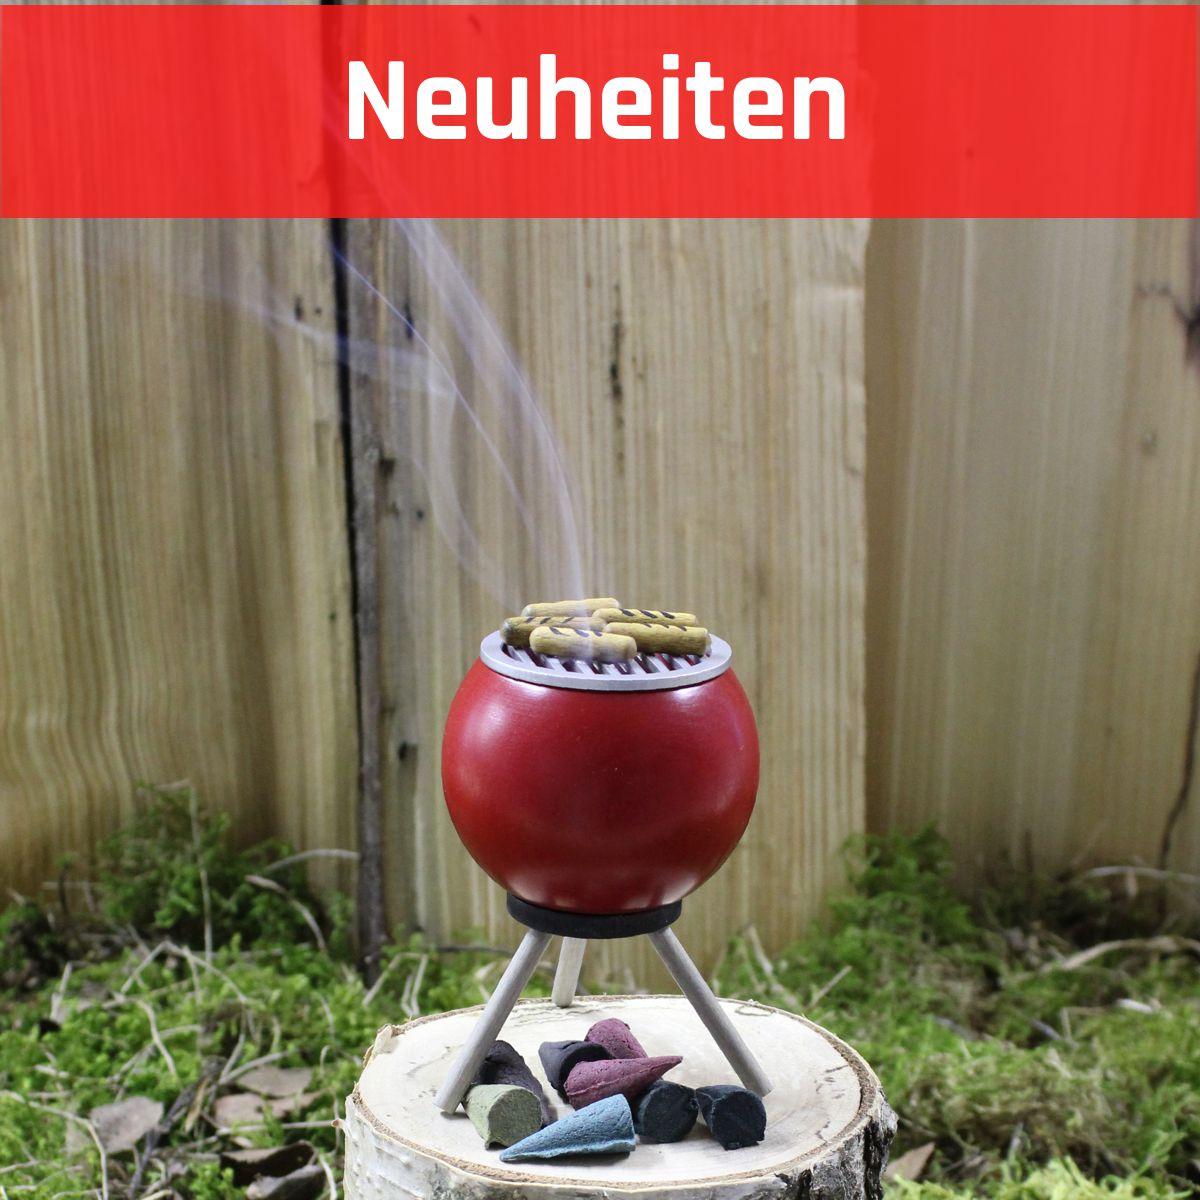 [Paket] Räuchergrill inkl. Crottendorfer Räucherkerzen Ruhe rot mit Bratwürsten 10 cm